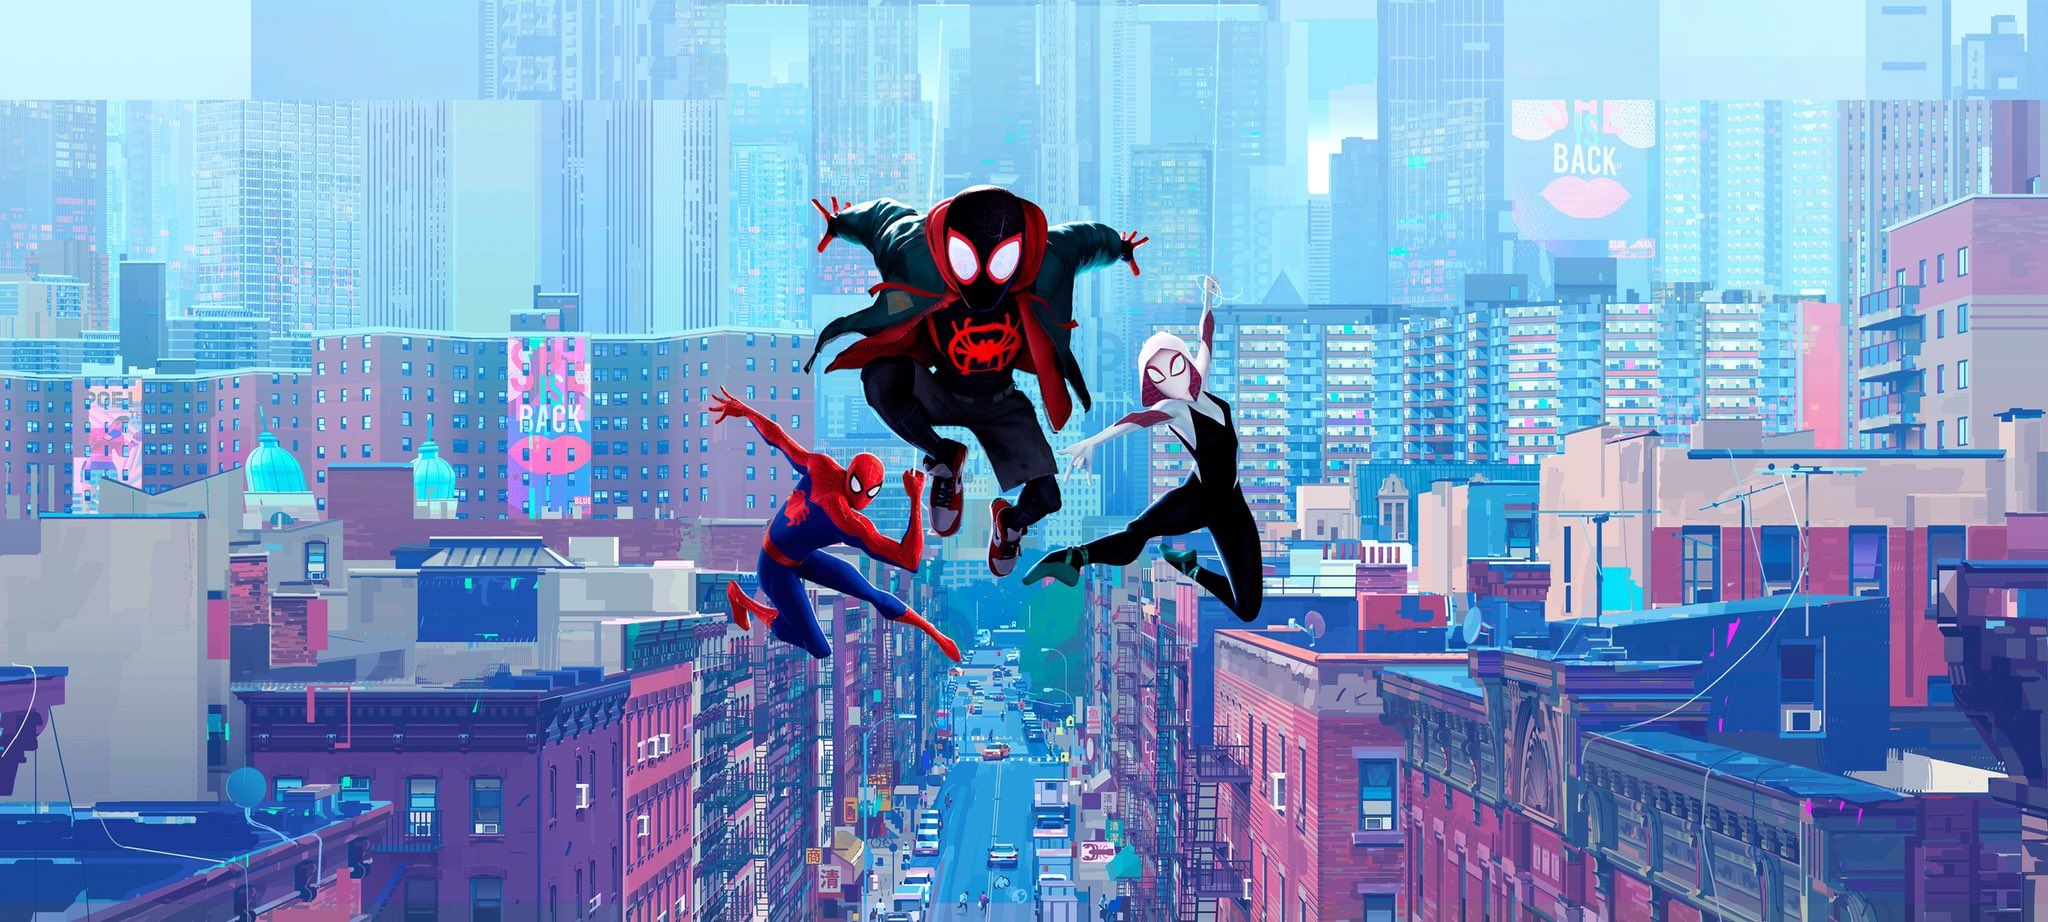 Hassan Hamid Watch The Globe On Twitter Spider Verse Comic Book Wallpaper Spiderman Spider man into spider verse wallpaper